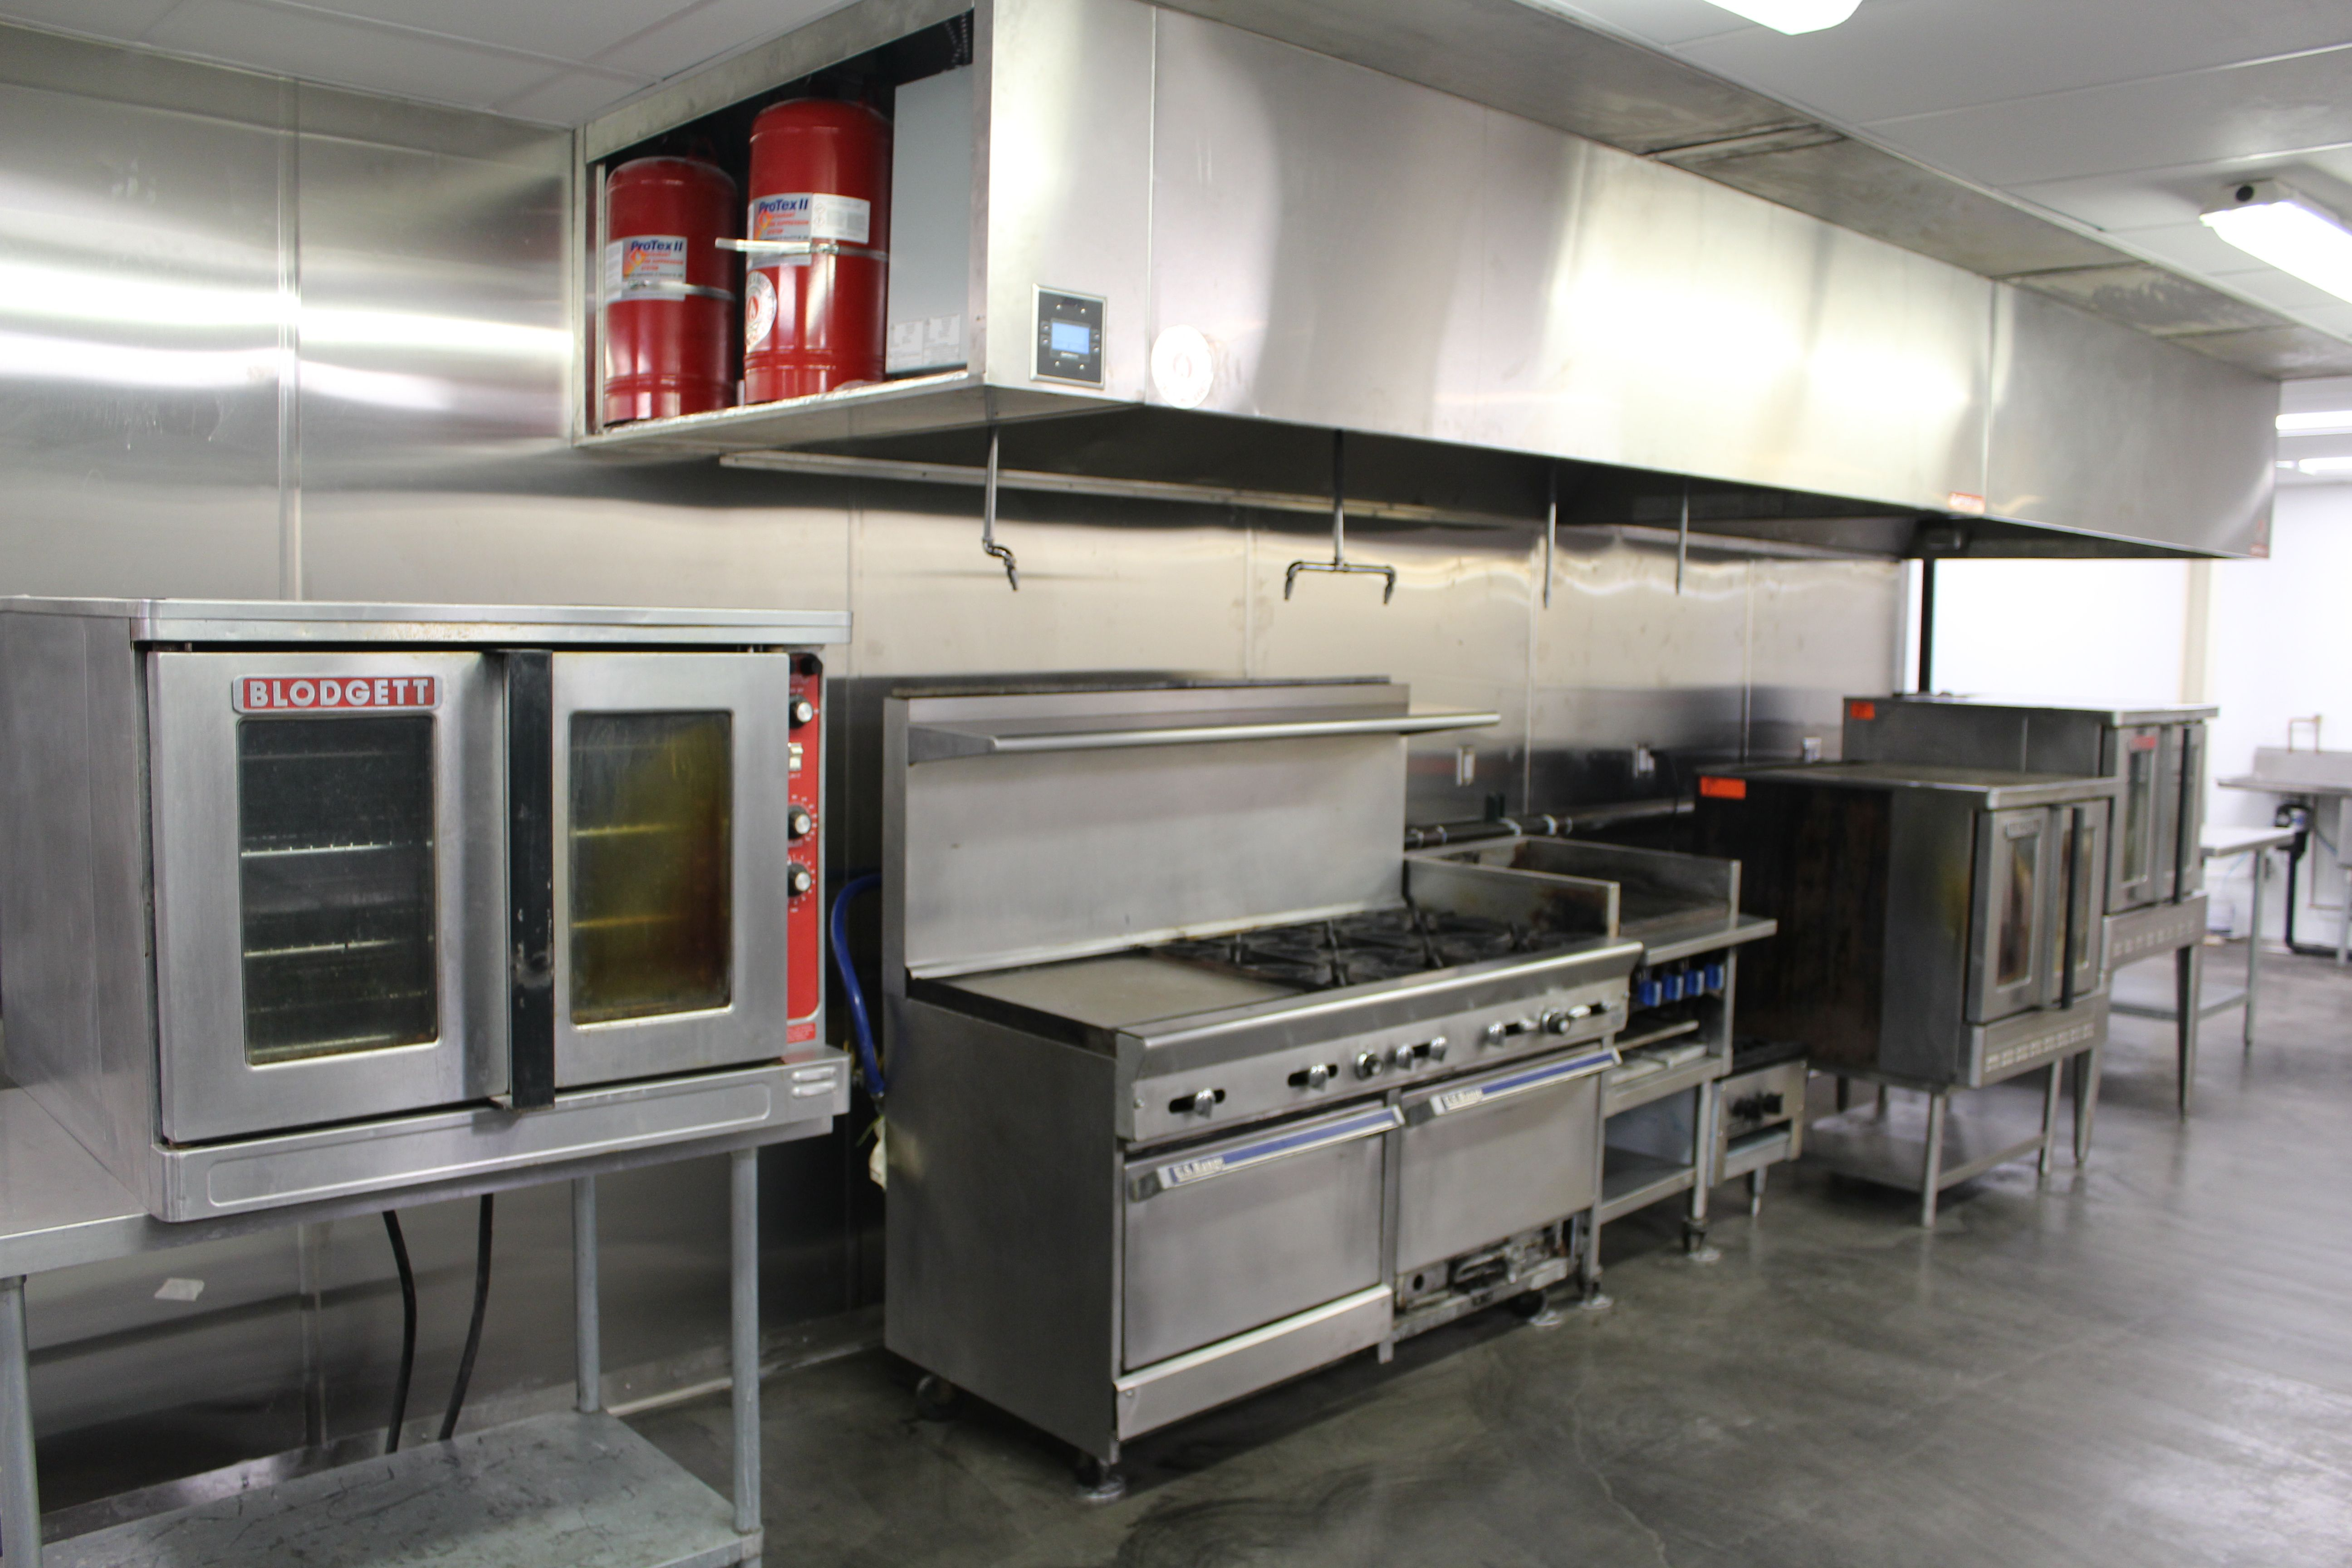 Commissary kitchen denver di 2020 hidup hidup sehat